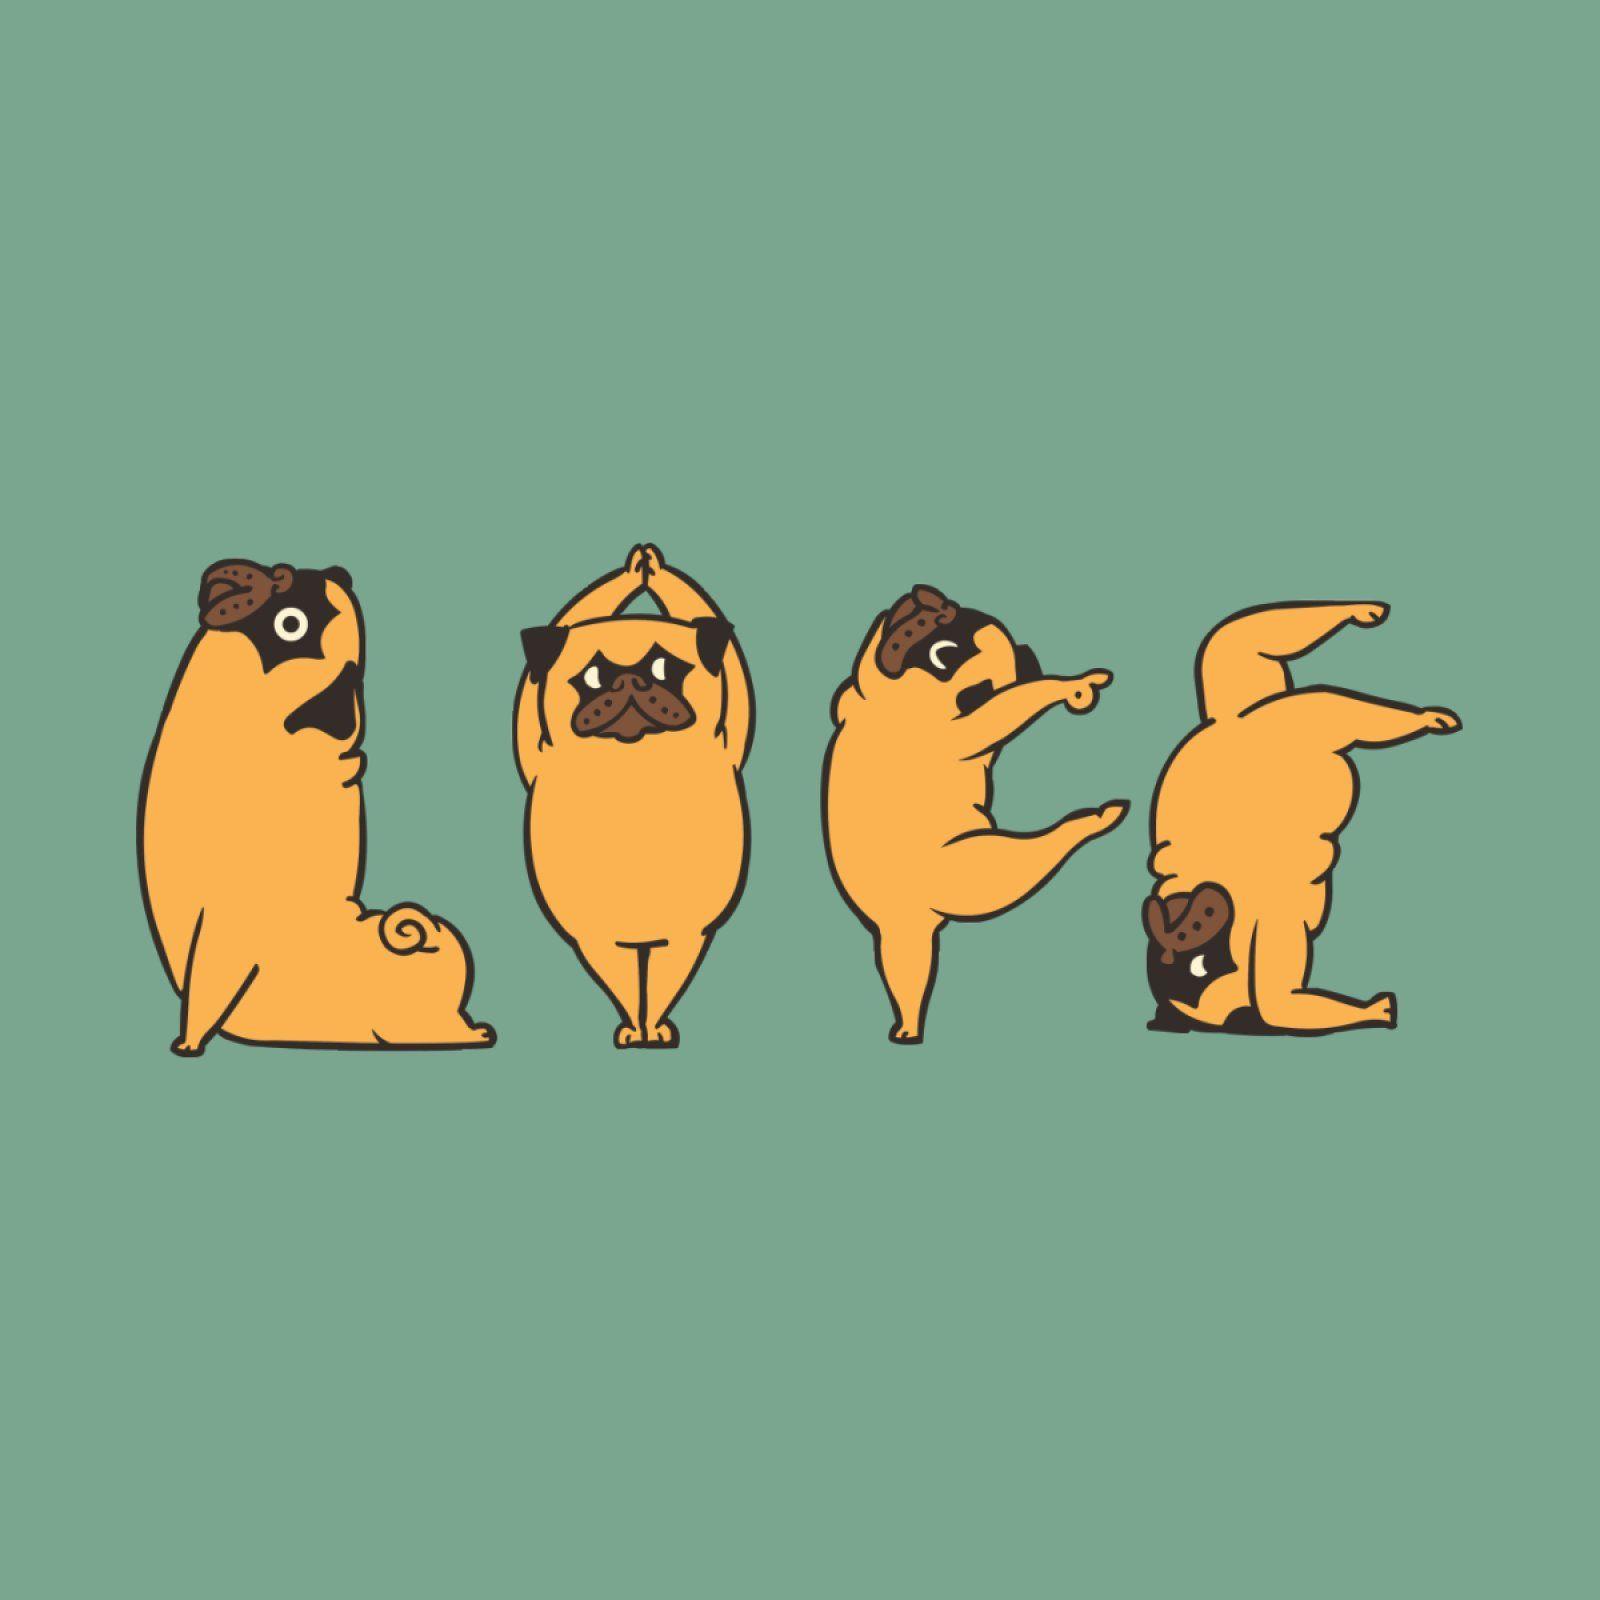 Yoga Life In 2020 Pug Art Cute Drawings Funny Drawings Funny pug doing yoga iphone wallpaper